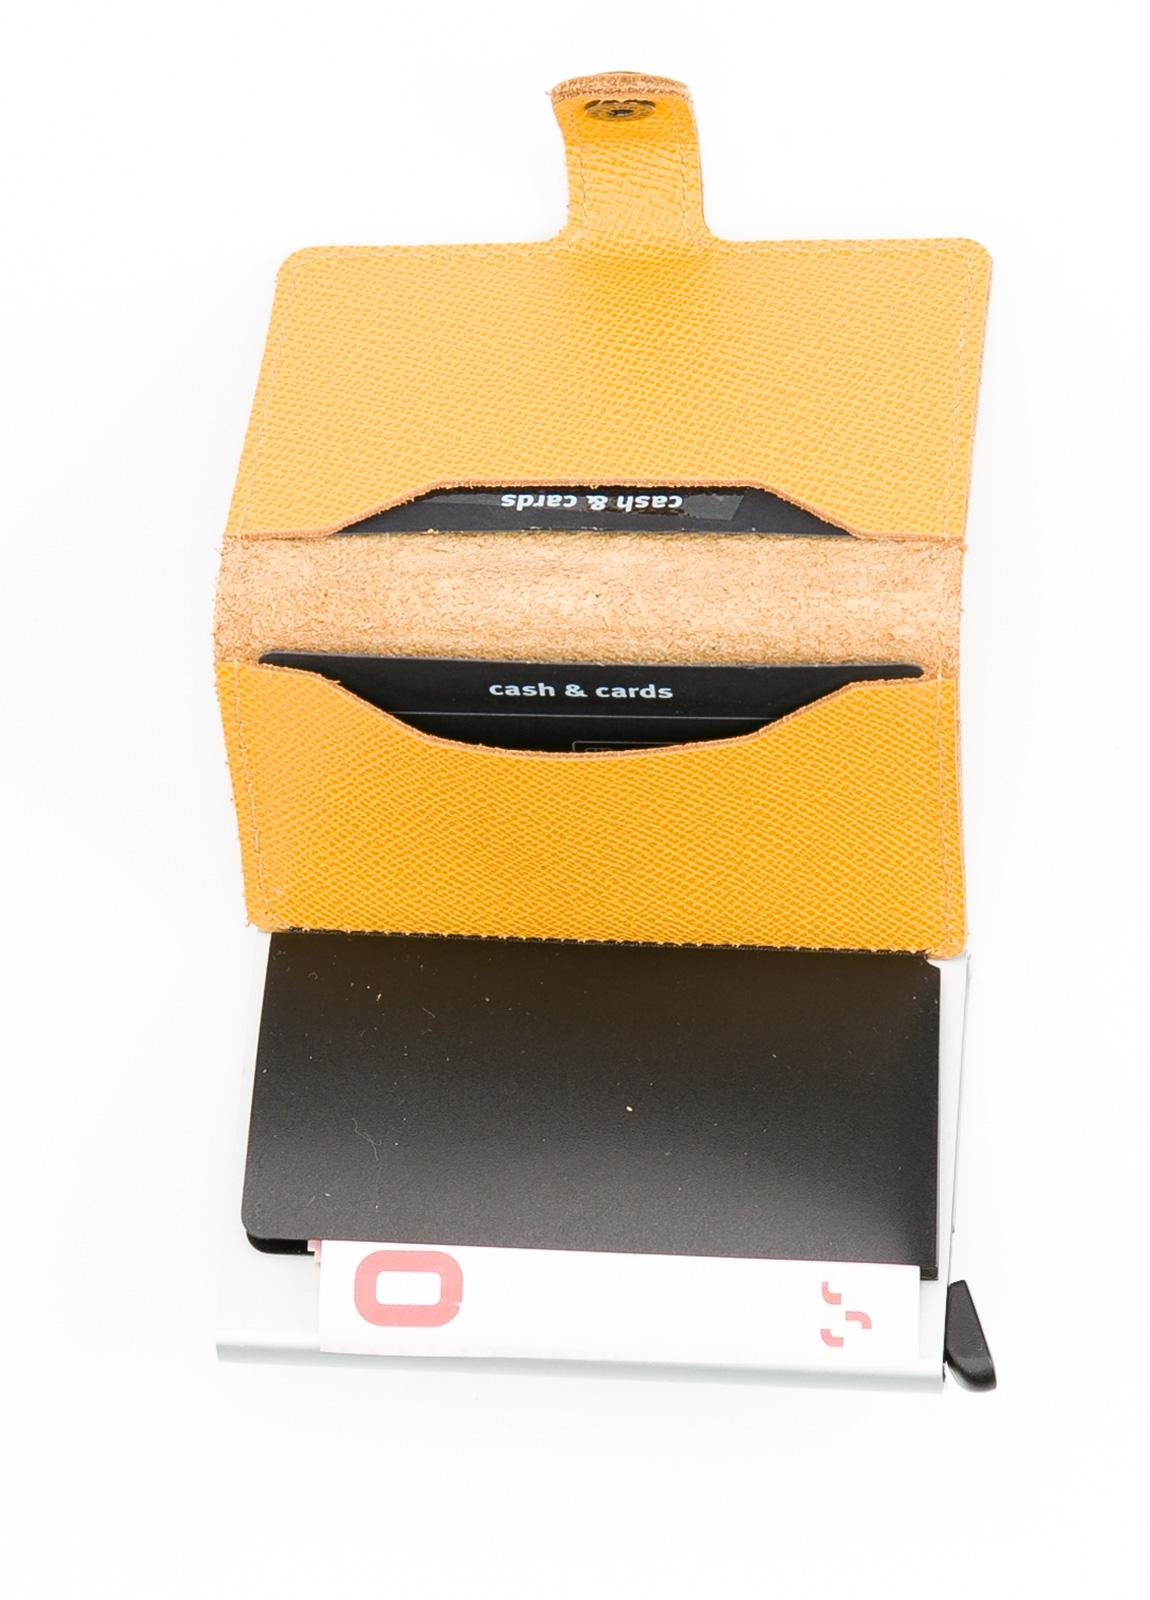 Tarjetero Secrid MINIWALLET Piel amarillo - Ítem1